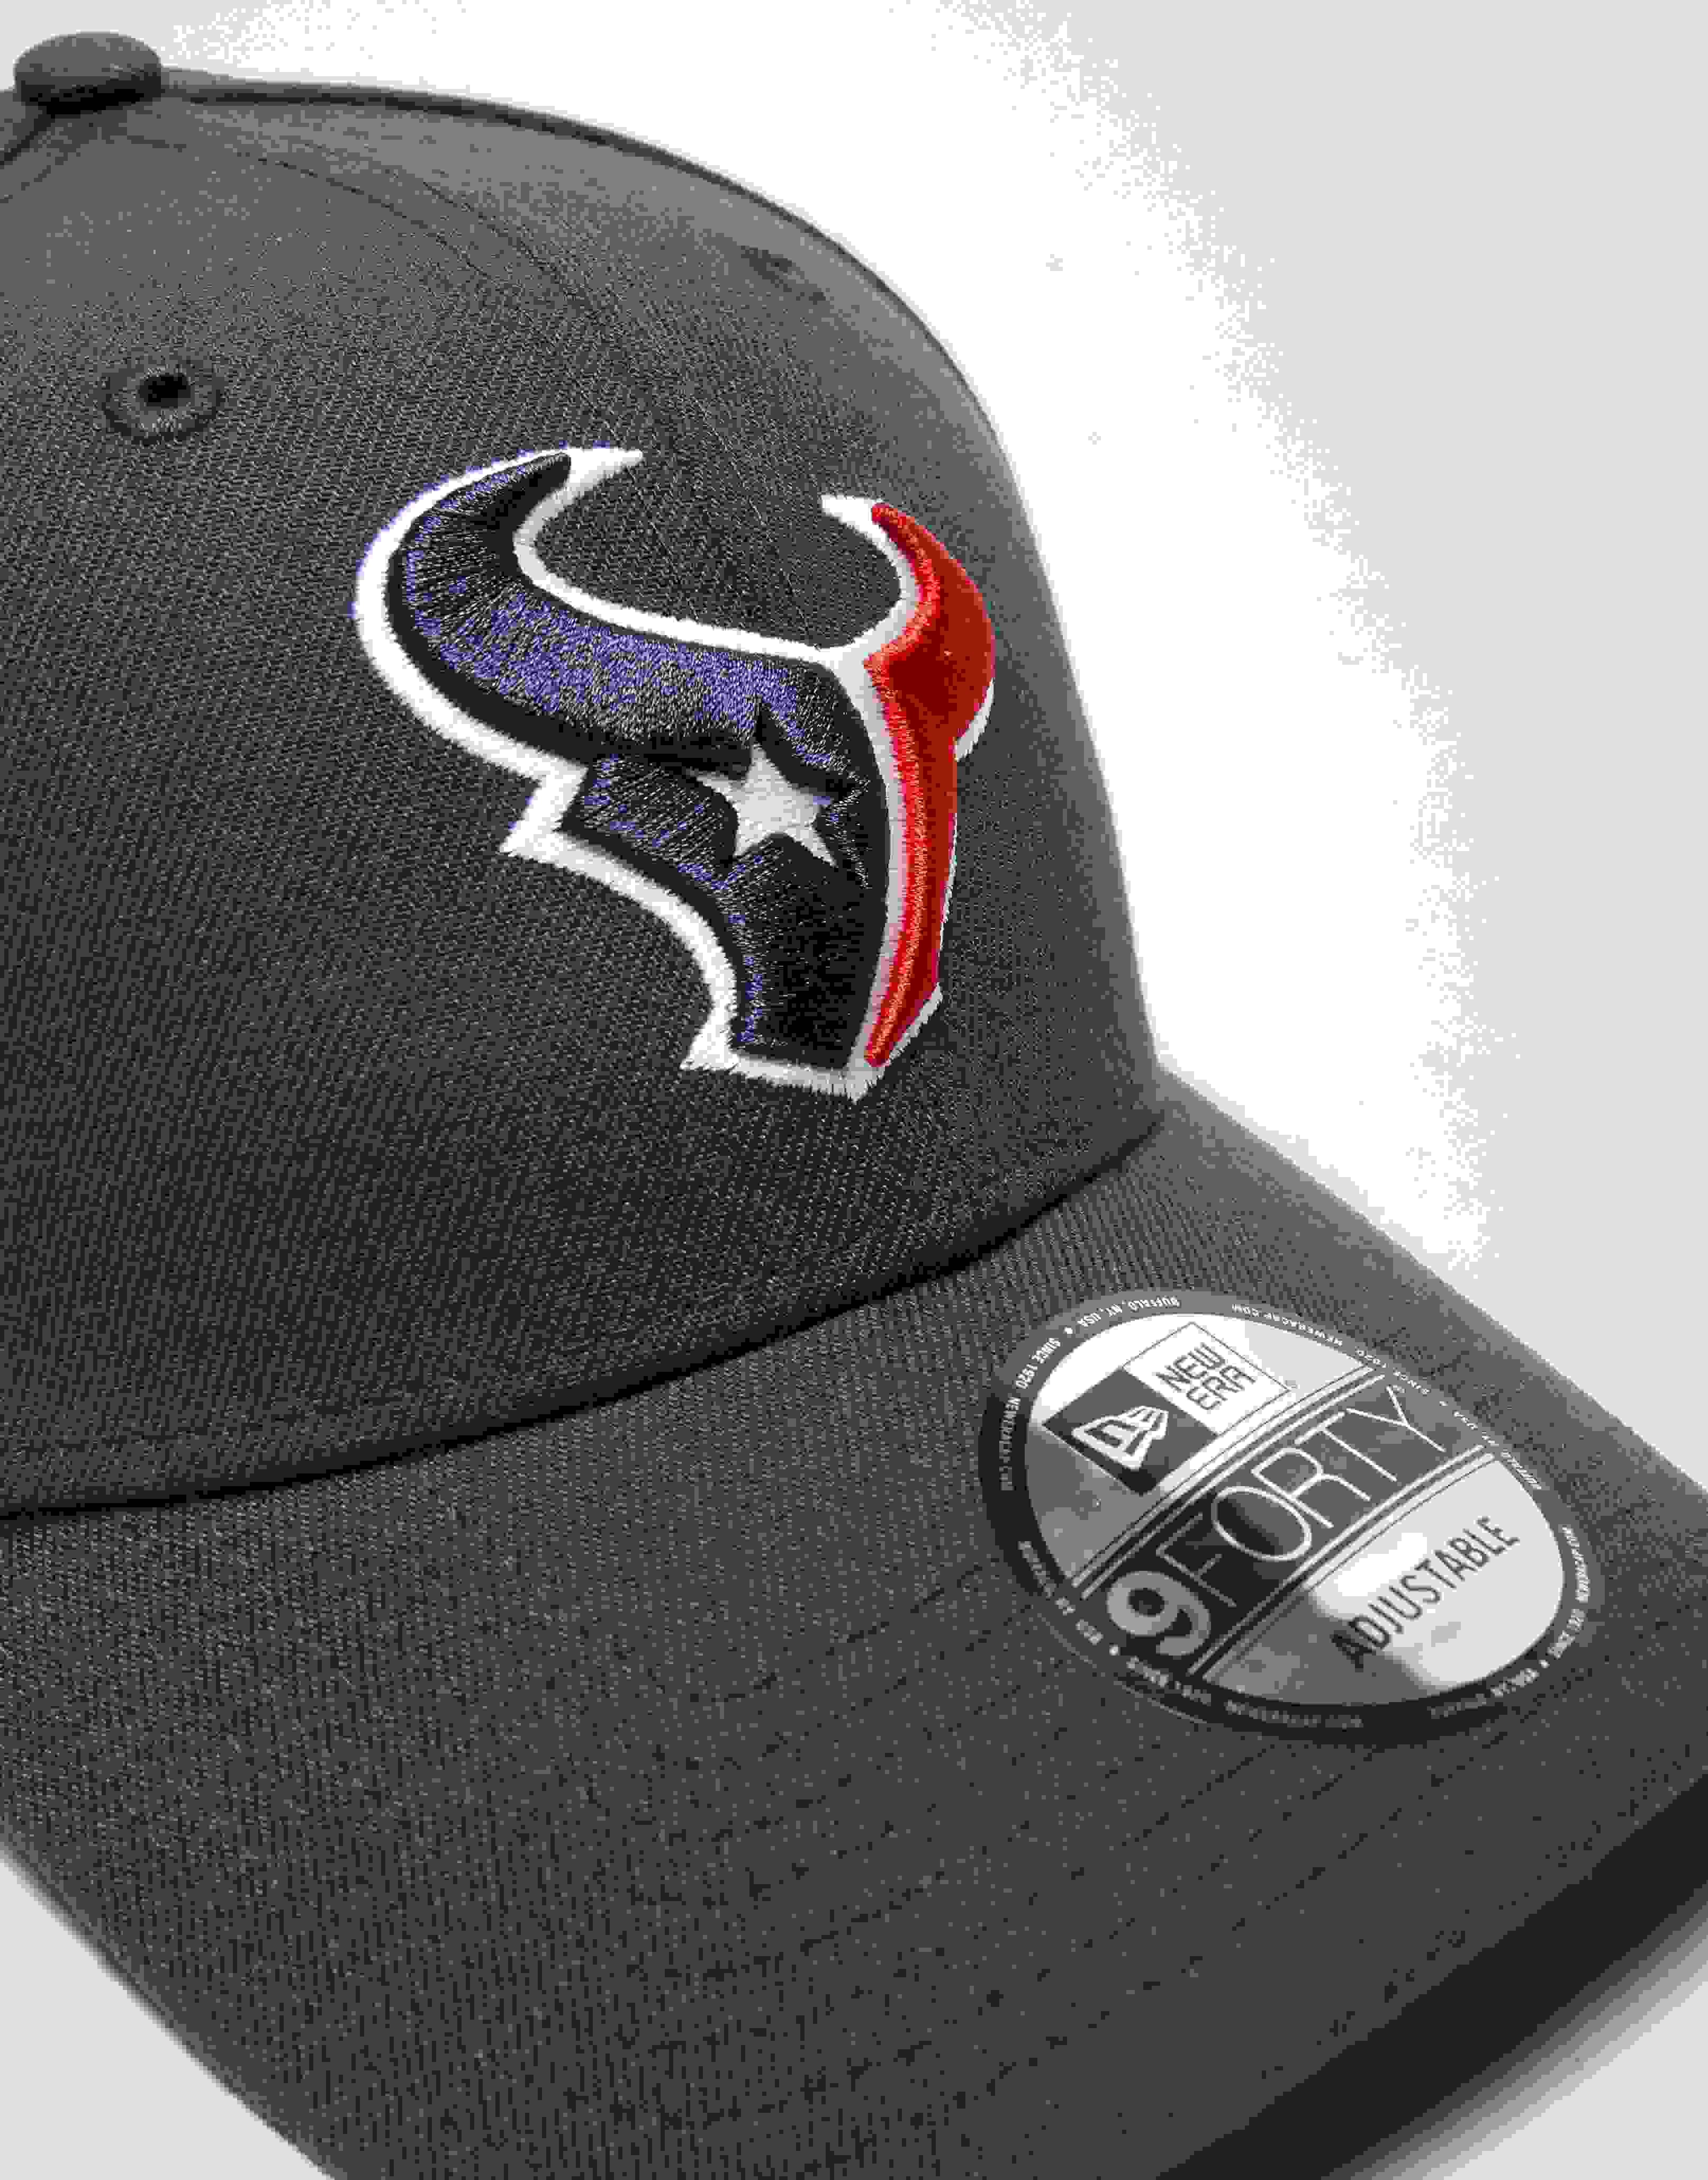 GRAPHITE Houston Texans New Era 59Fifty Cap